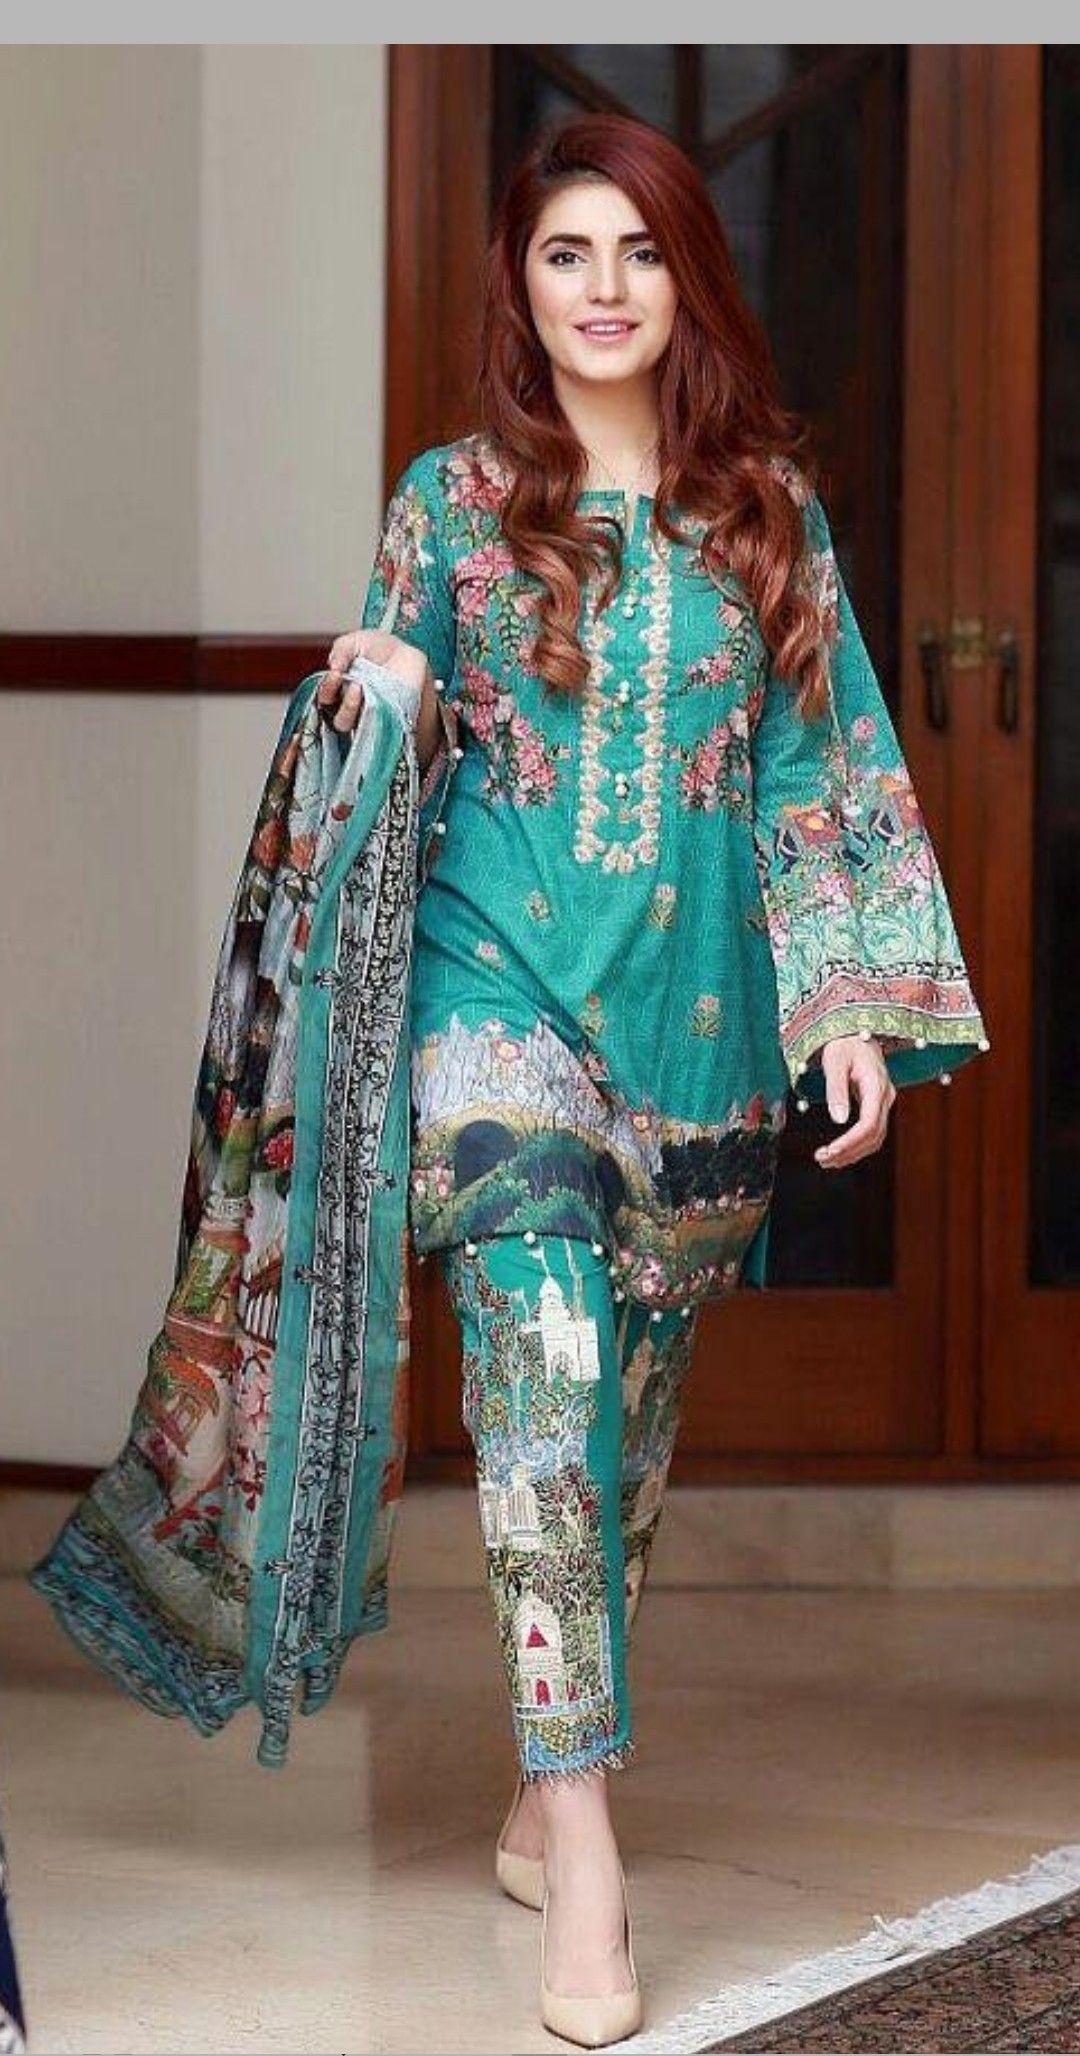 73b5f96c9d Momina mustehsan | Fashion/Beauty/Hair in 2019 | Pakistani dresses ...